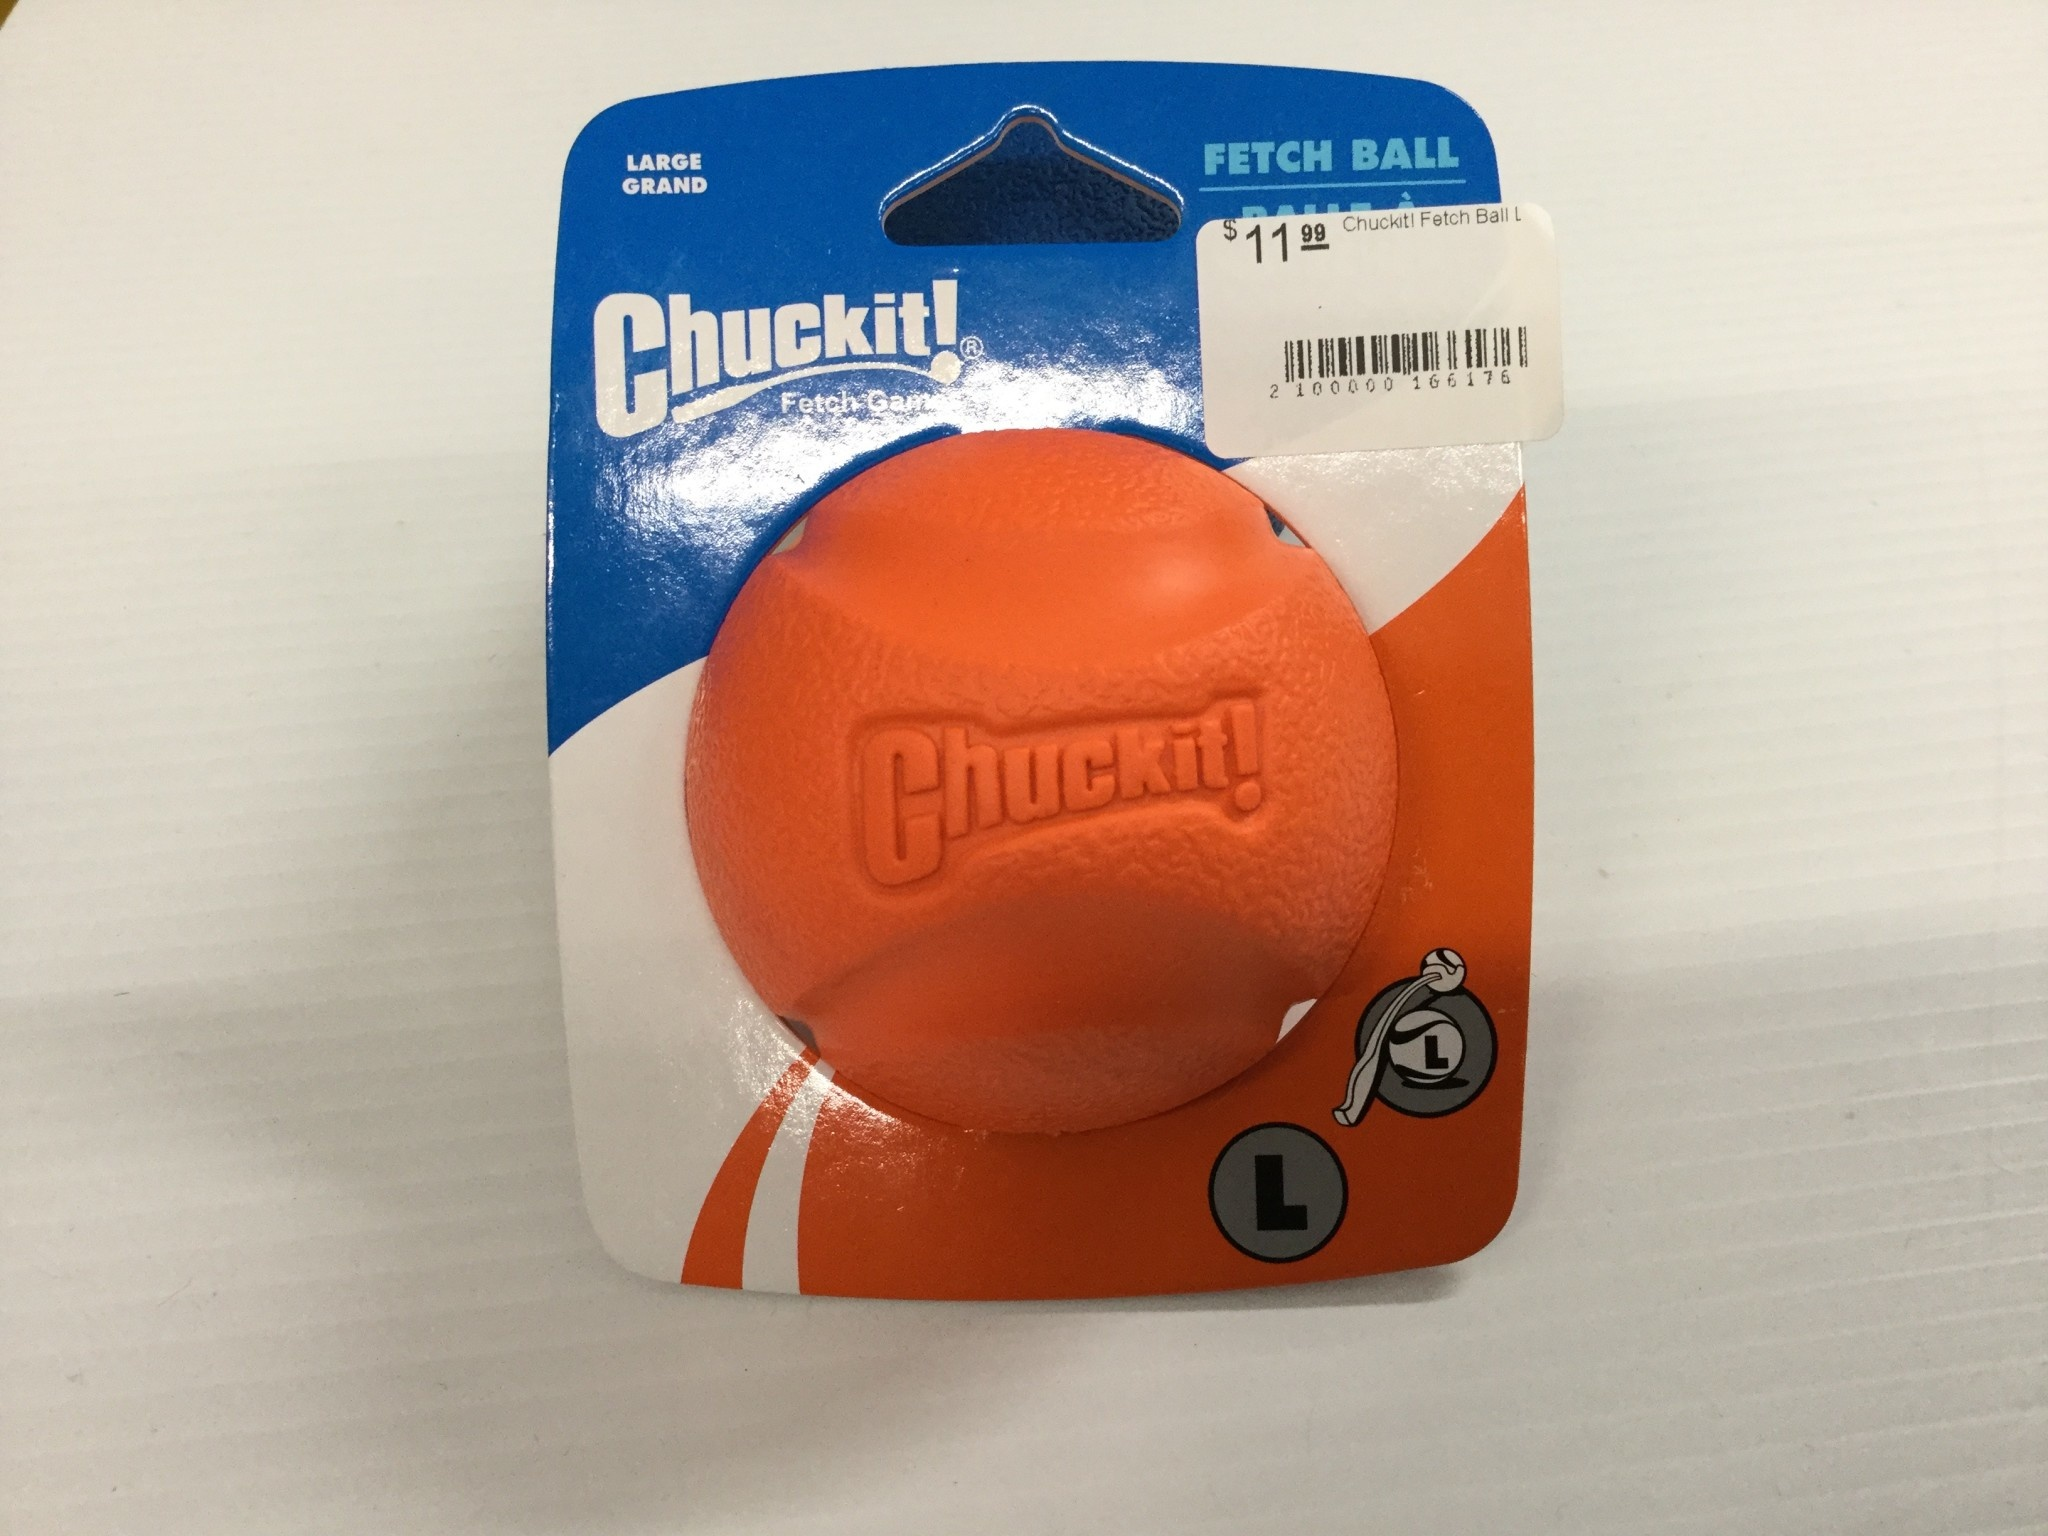 Chuckit! Fetch Ball Large Orange/Blue-2